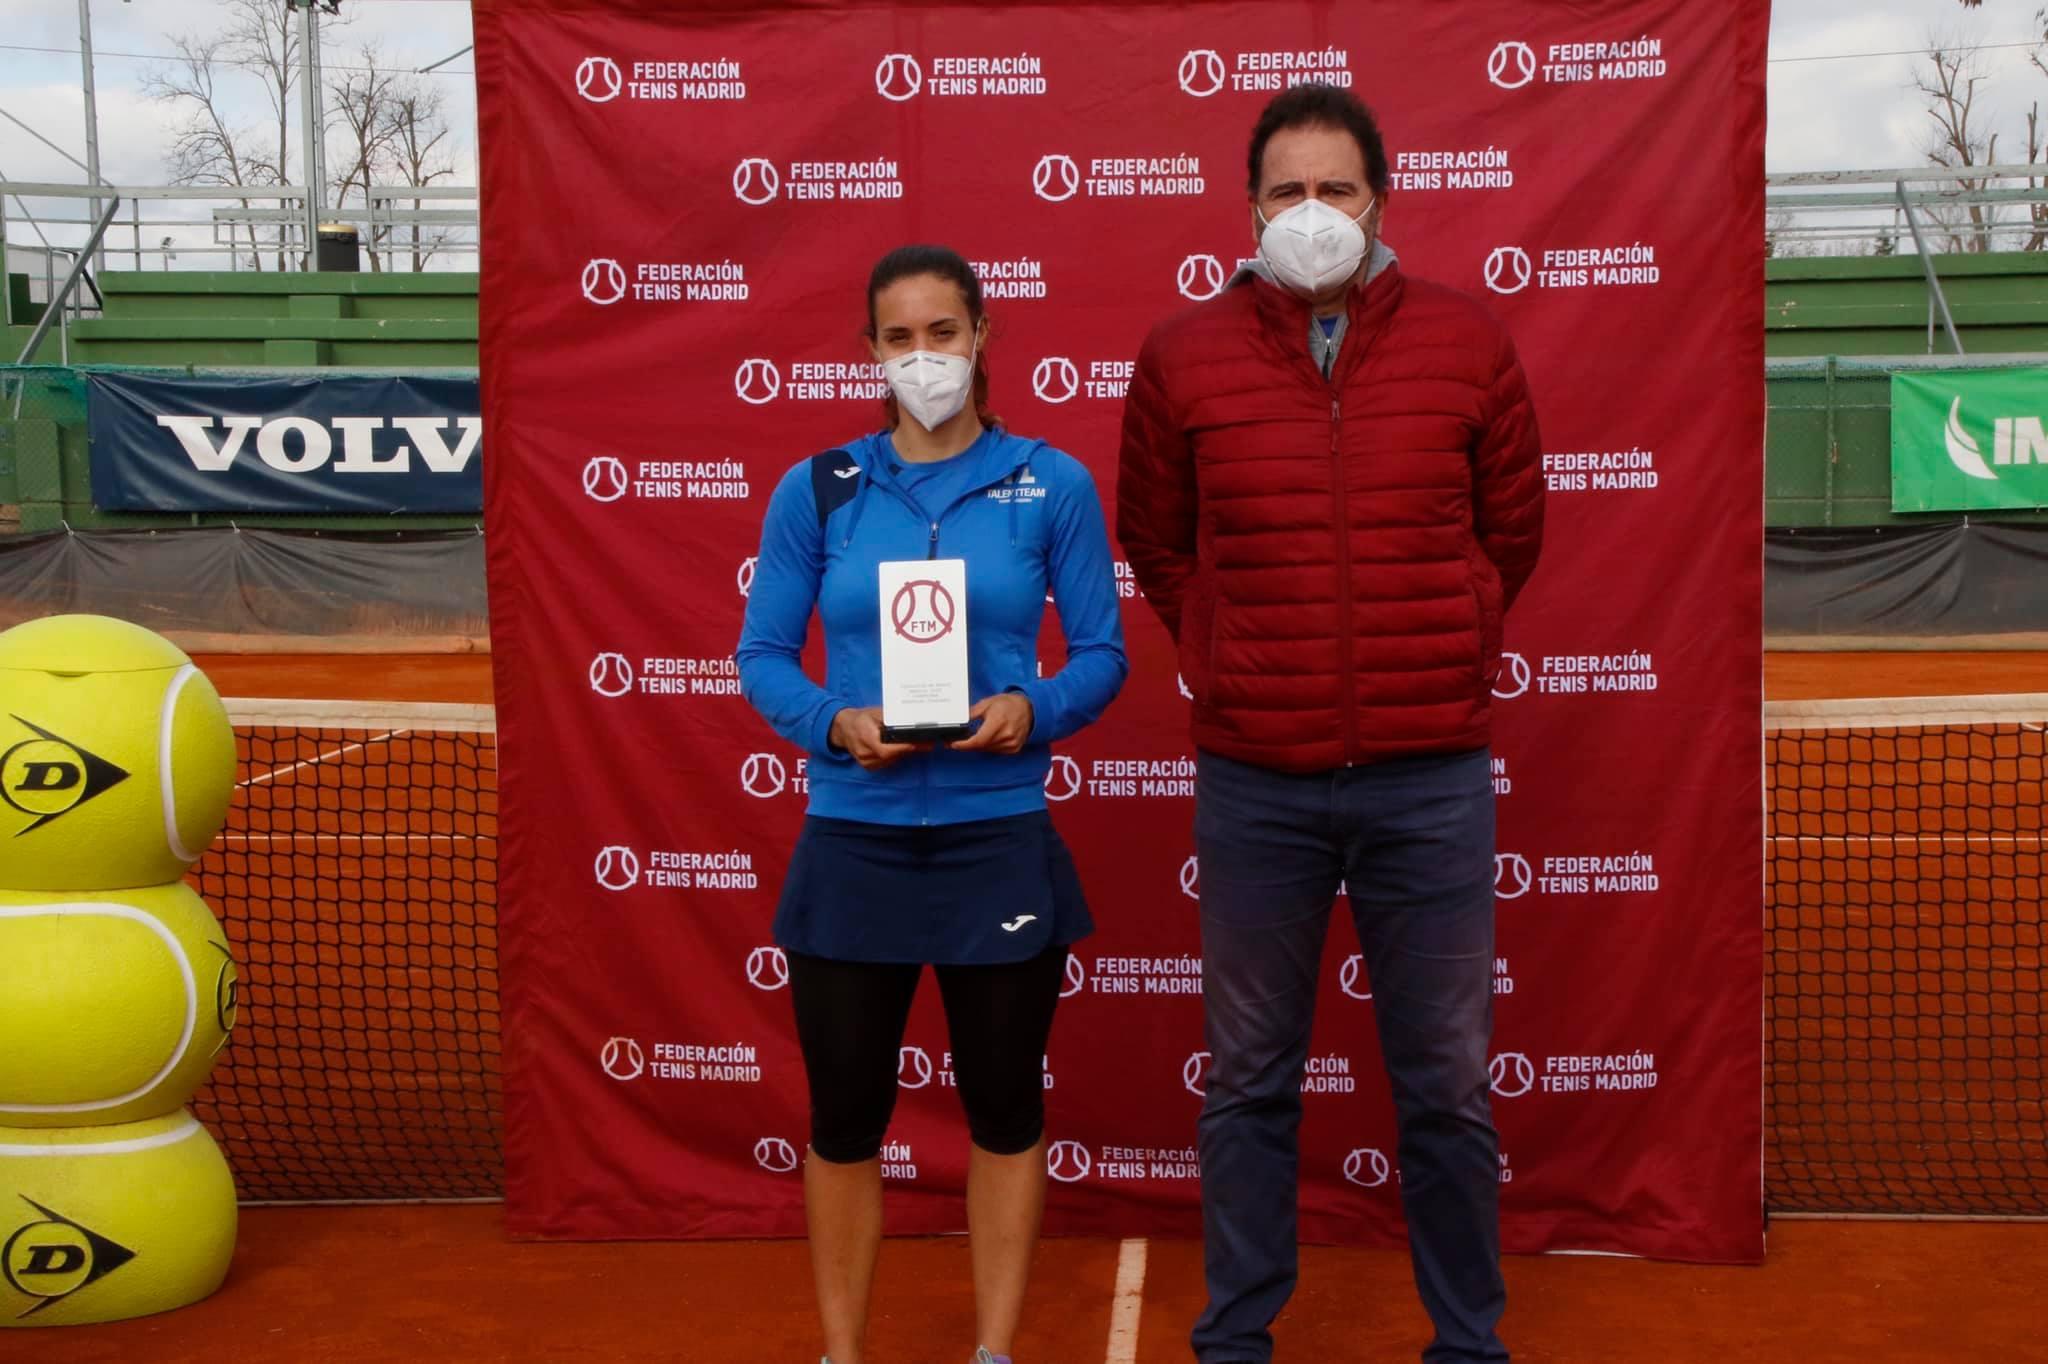 Olga Sáez, campeona, junto a Tati Rascón, presidente FTM. Foto: FTM